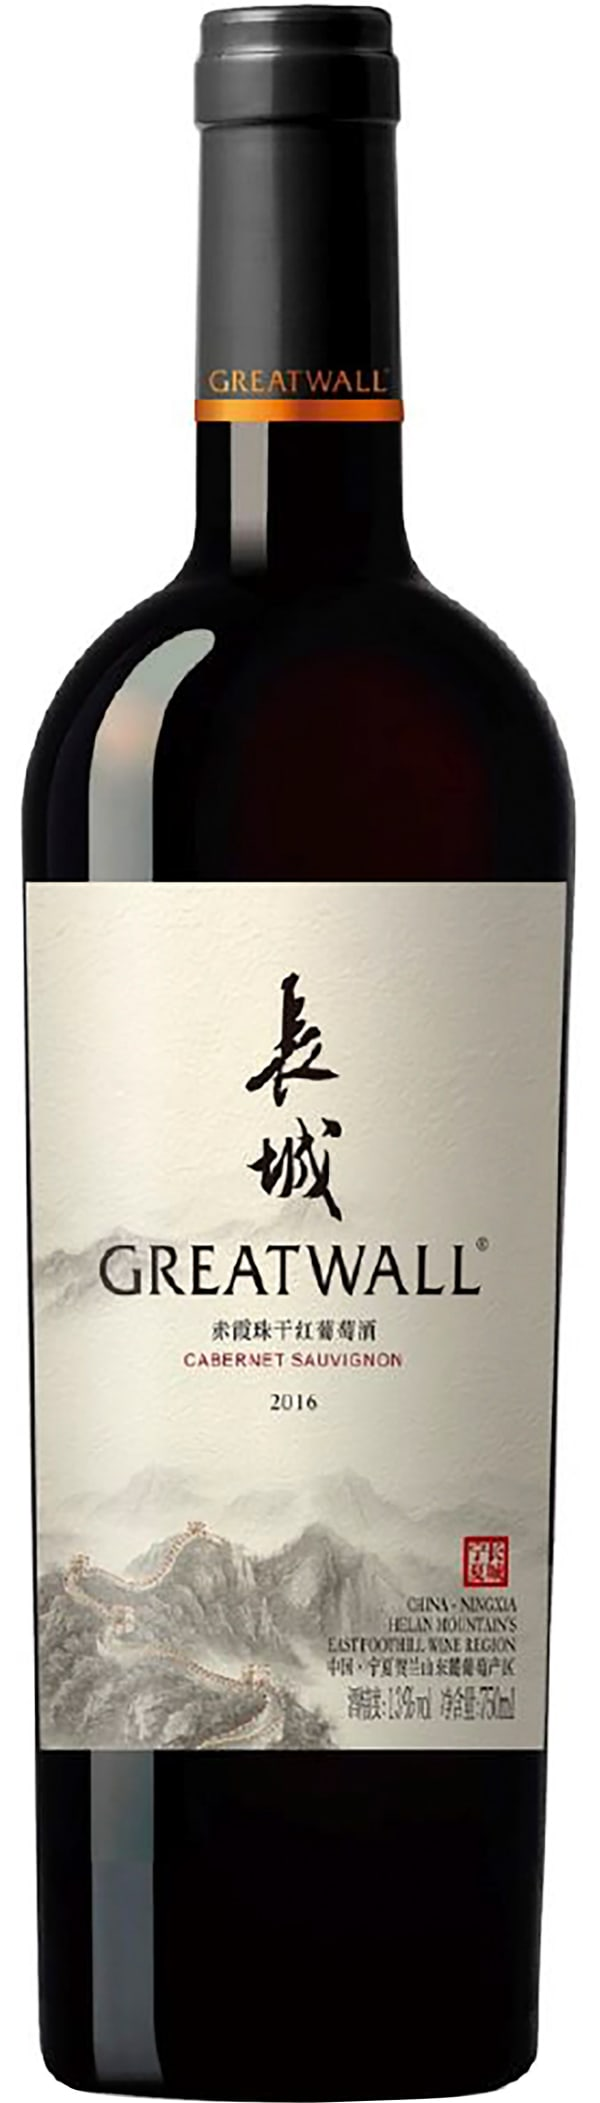 Greatwall Cabernet Sauvignon 2016